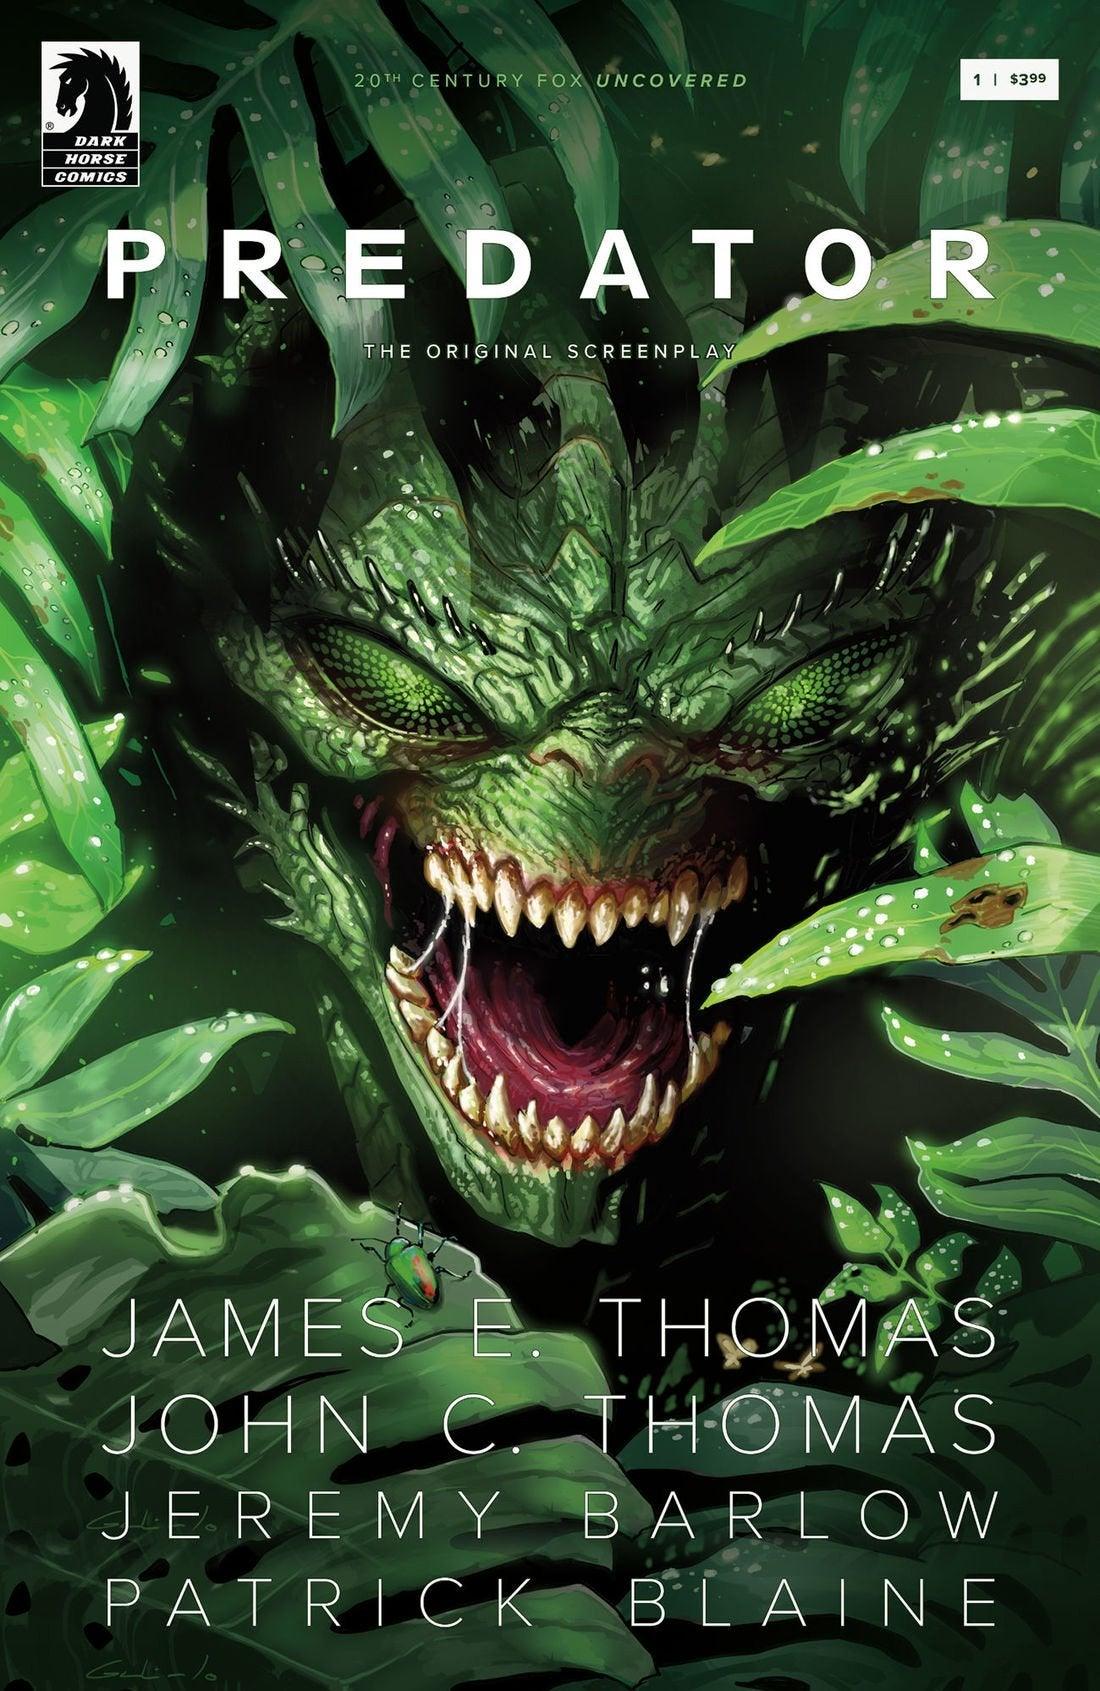 predator comic book cover issue 1 dark horse